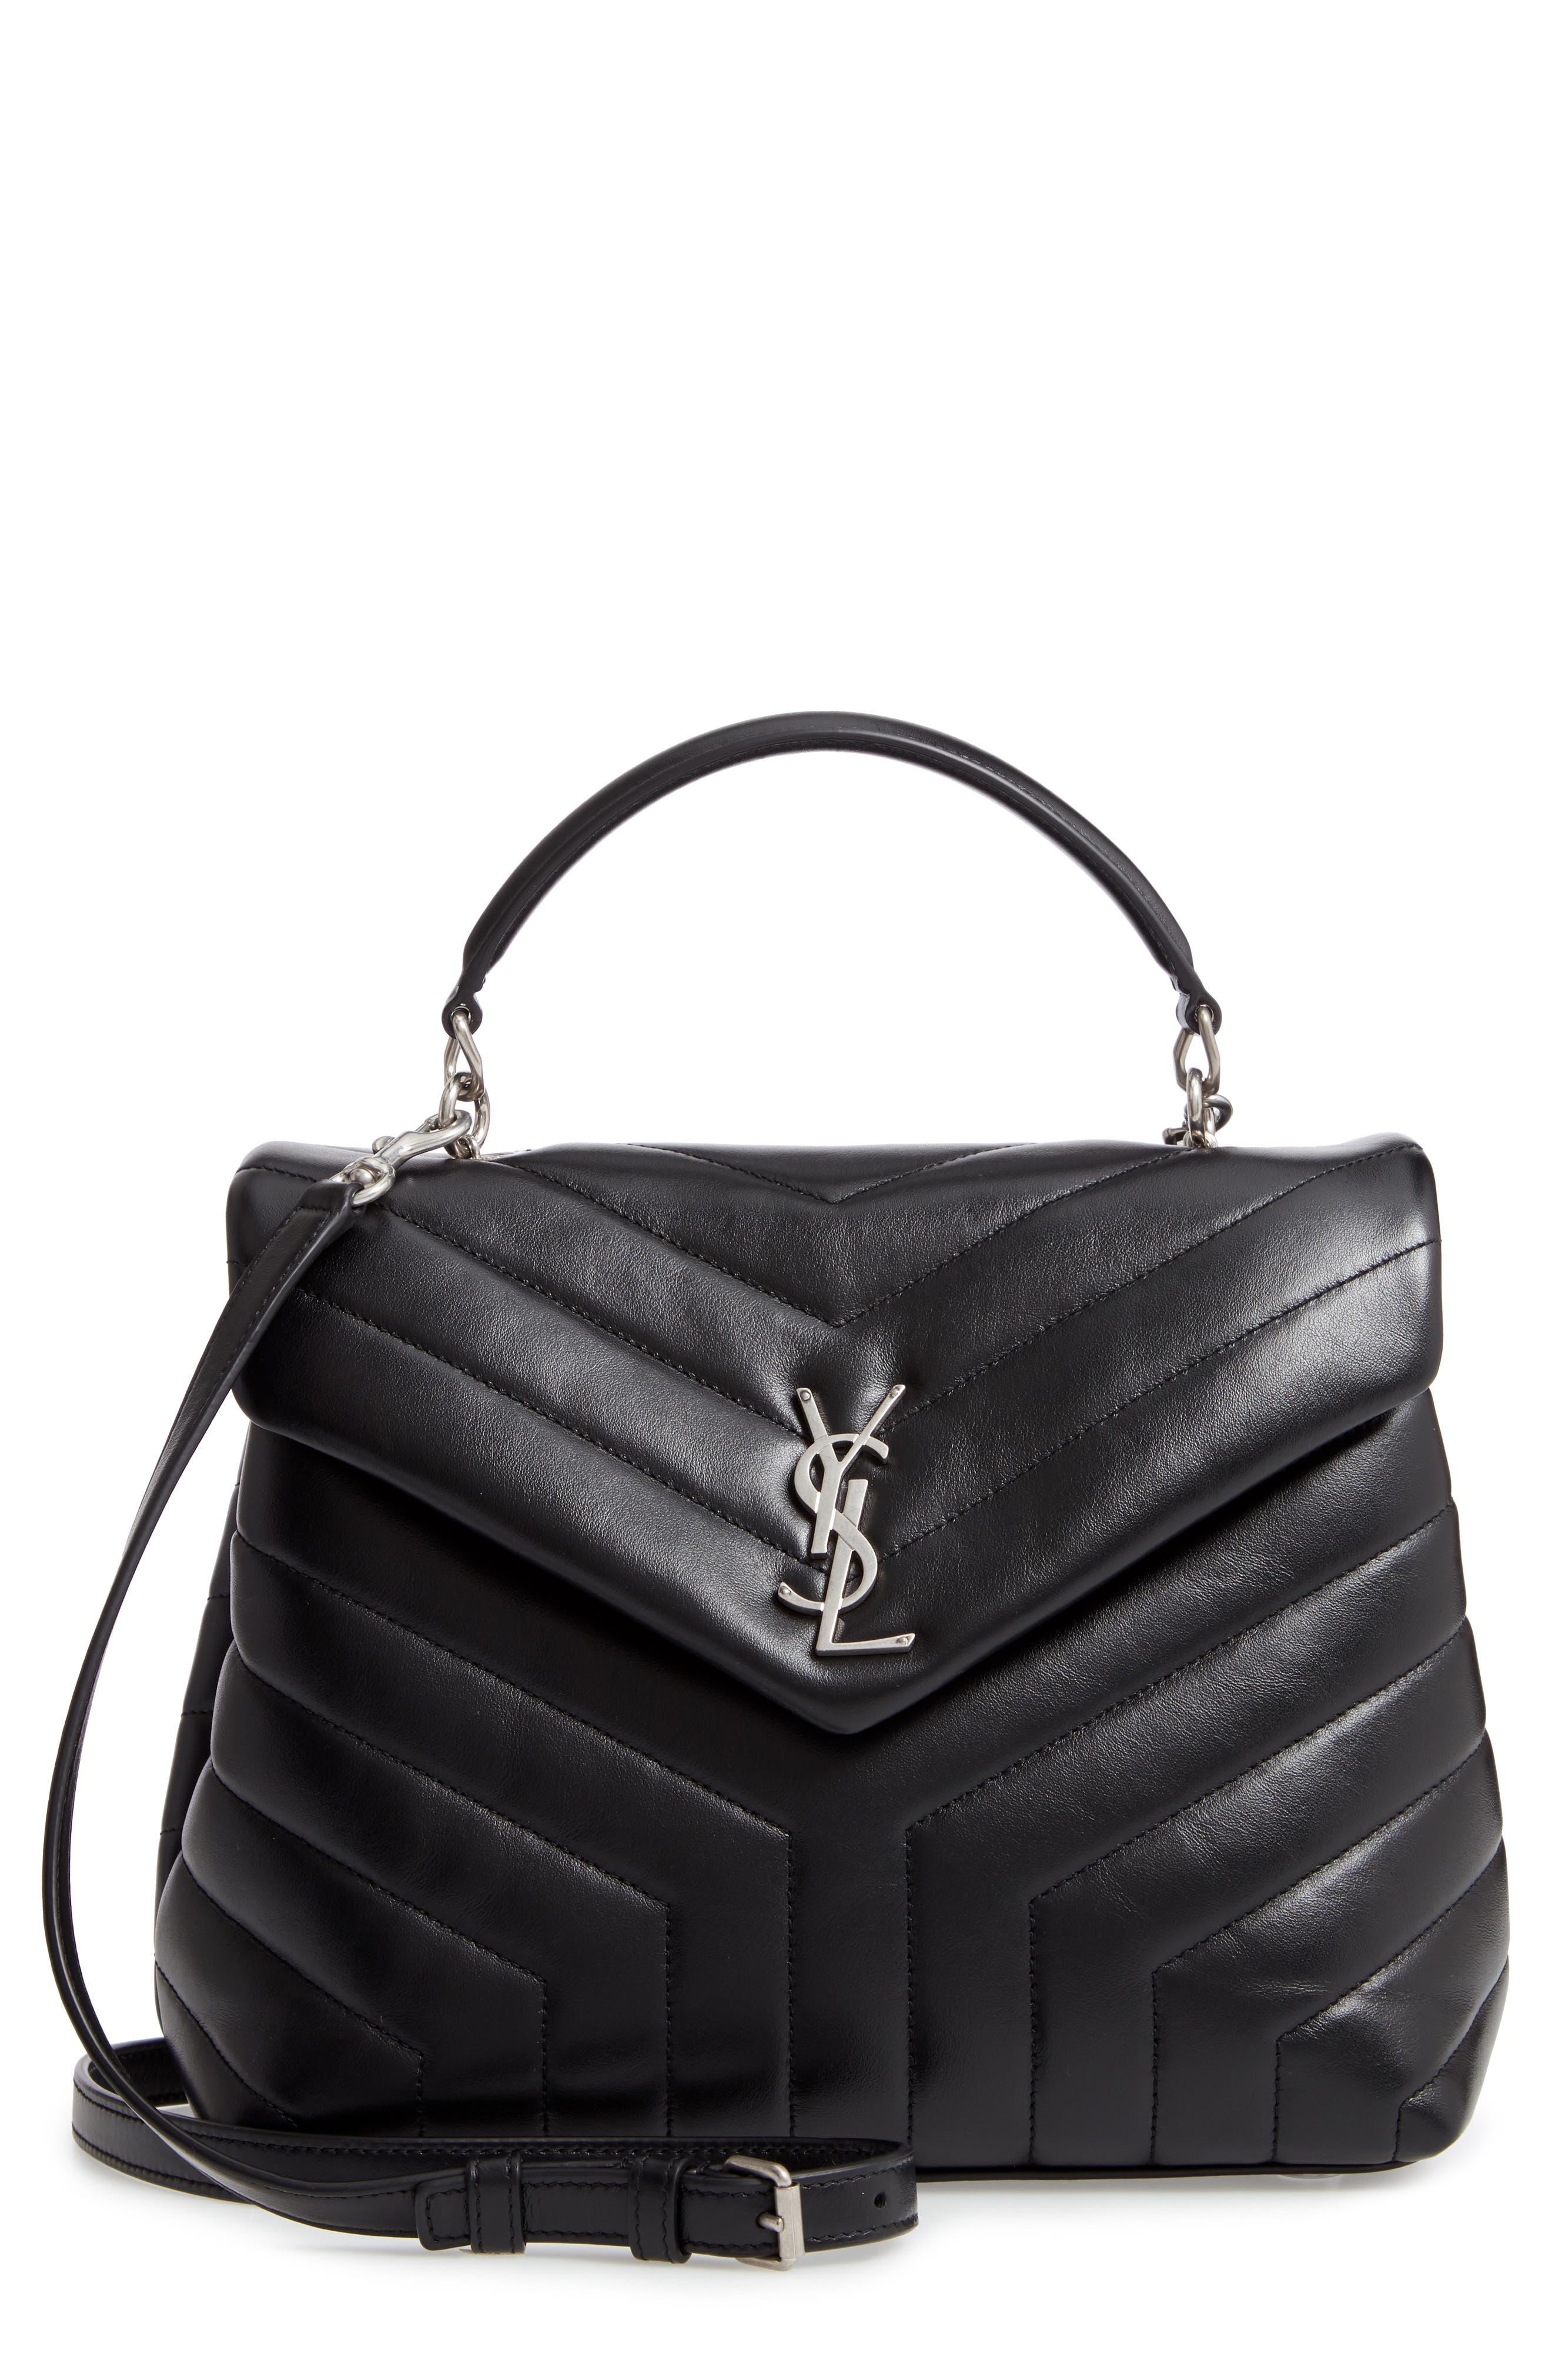 Loulou Leather Top Handle Satchel,                         Main,                         color, NERO/ NERO